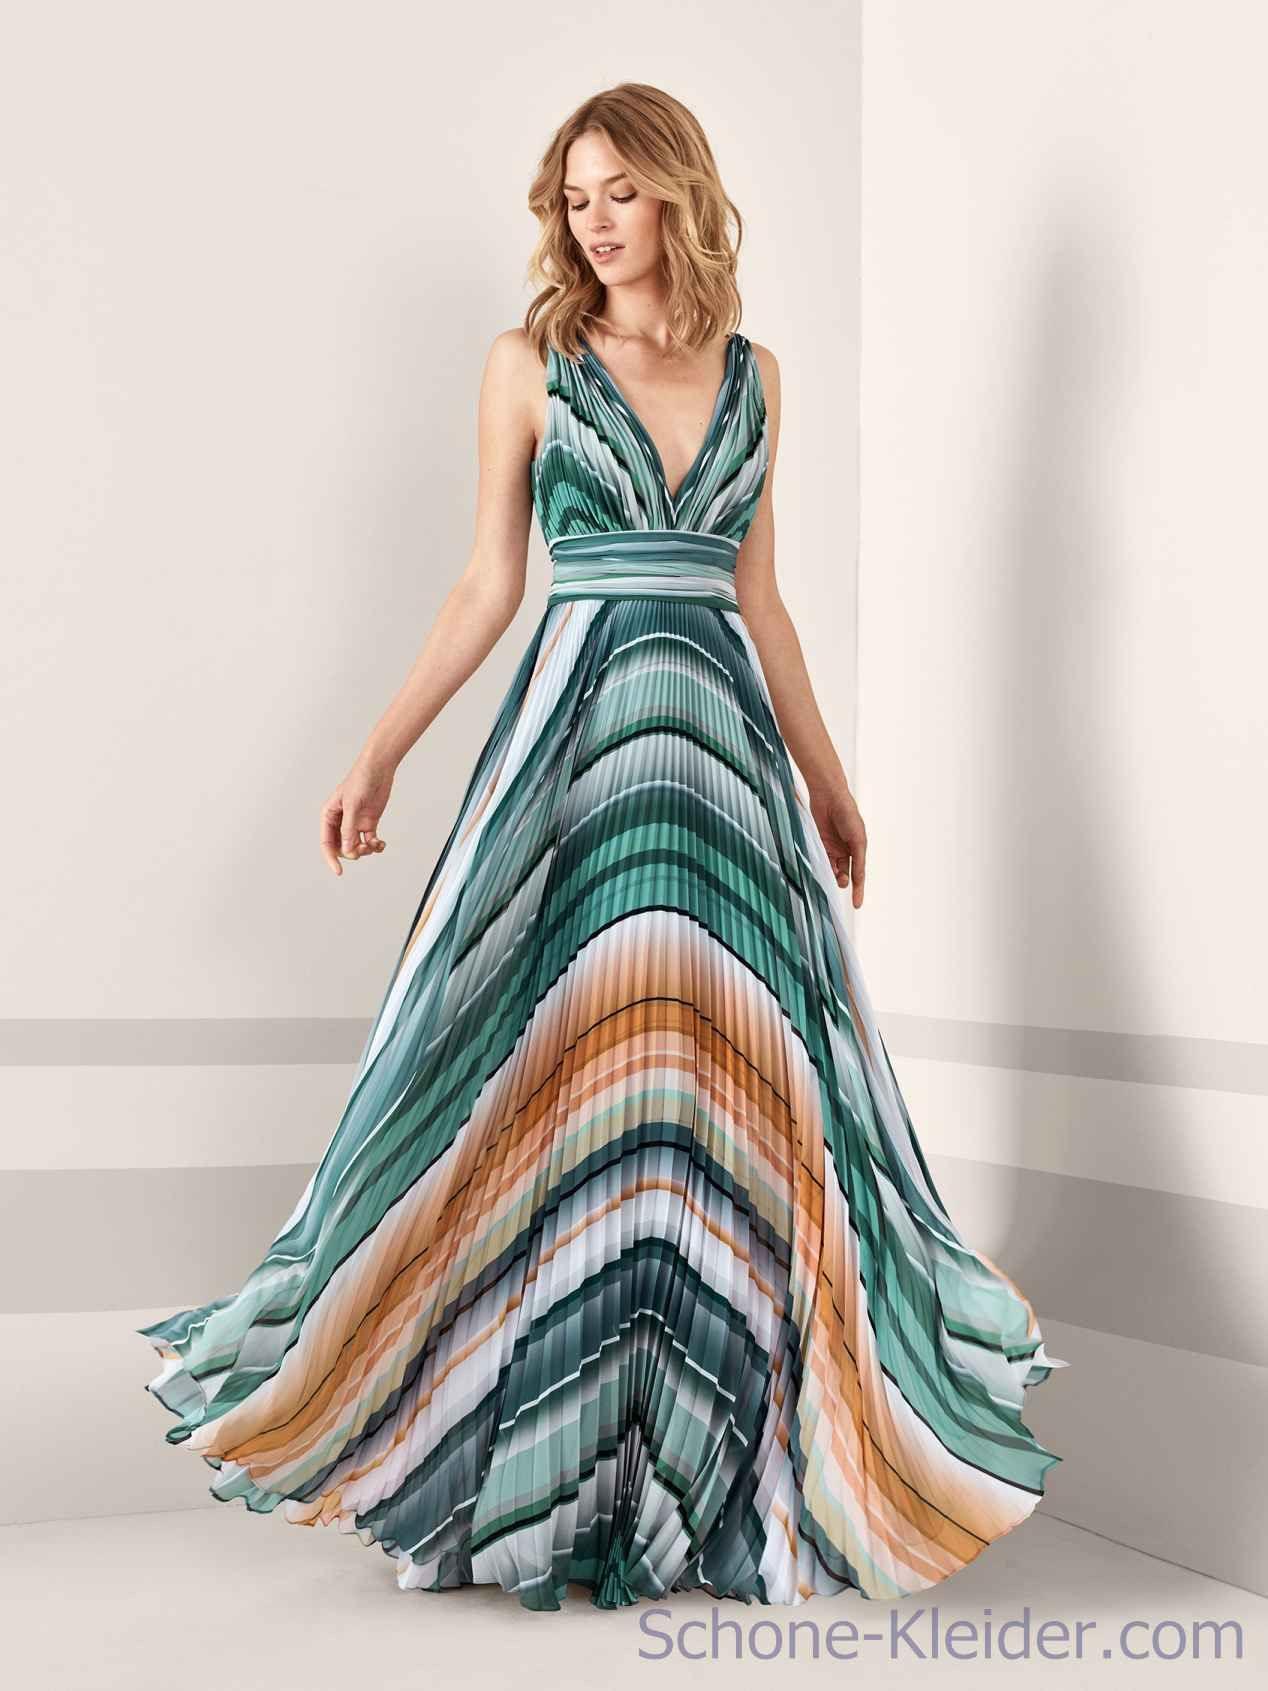 17 Perfekt Abendkleider Bonn Spezialgebiet10 Spektakulär Abendkleider Bonn Ärmel